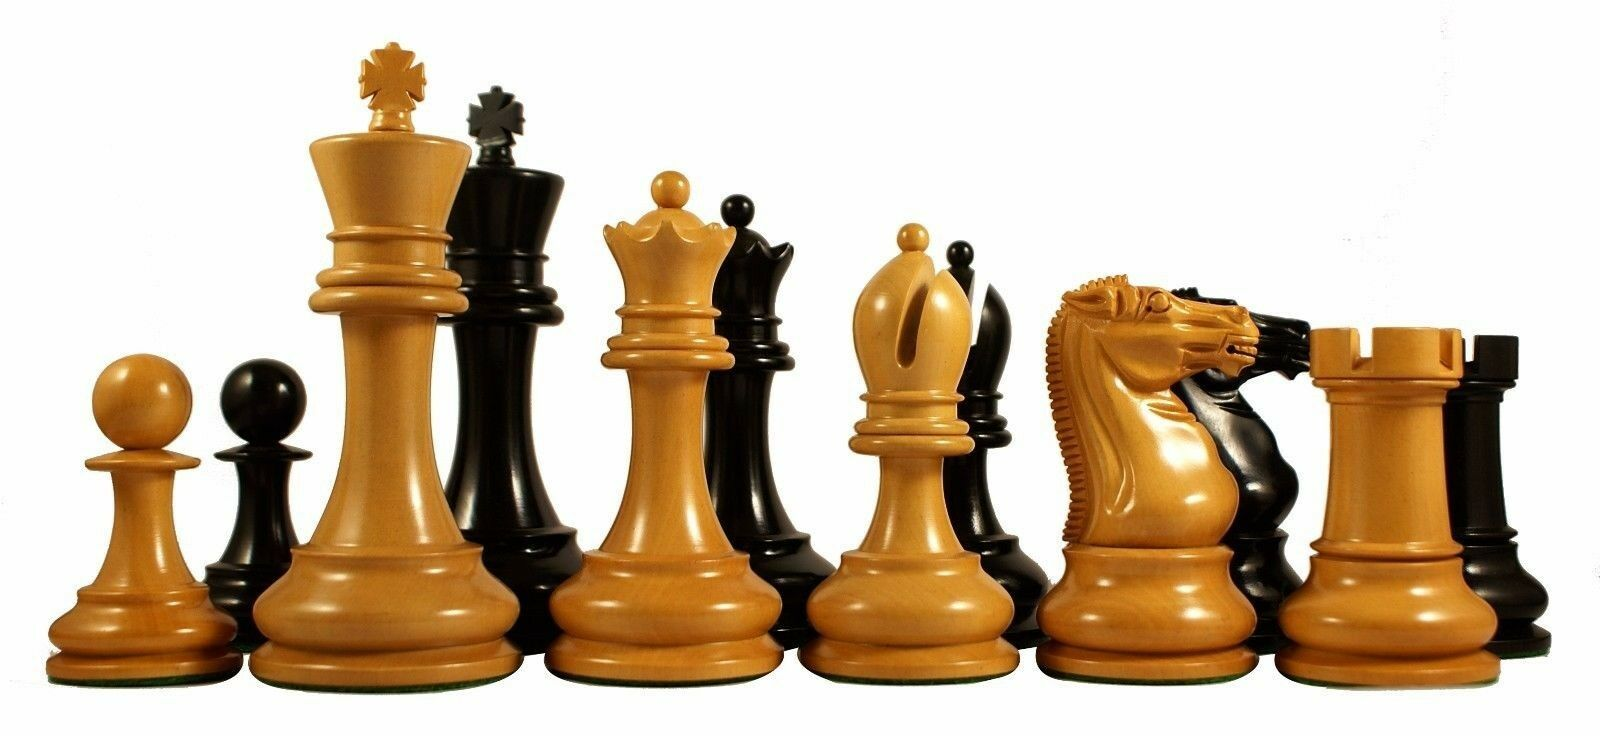 Reproduction BCC 1900-01 Edition Staunton Stroud Club Ebony Chessmen